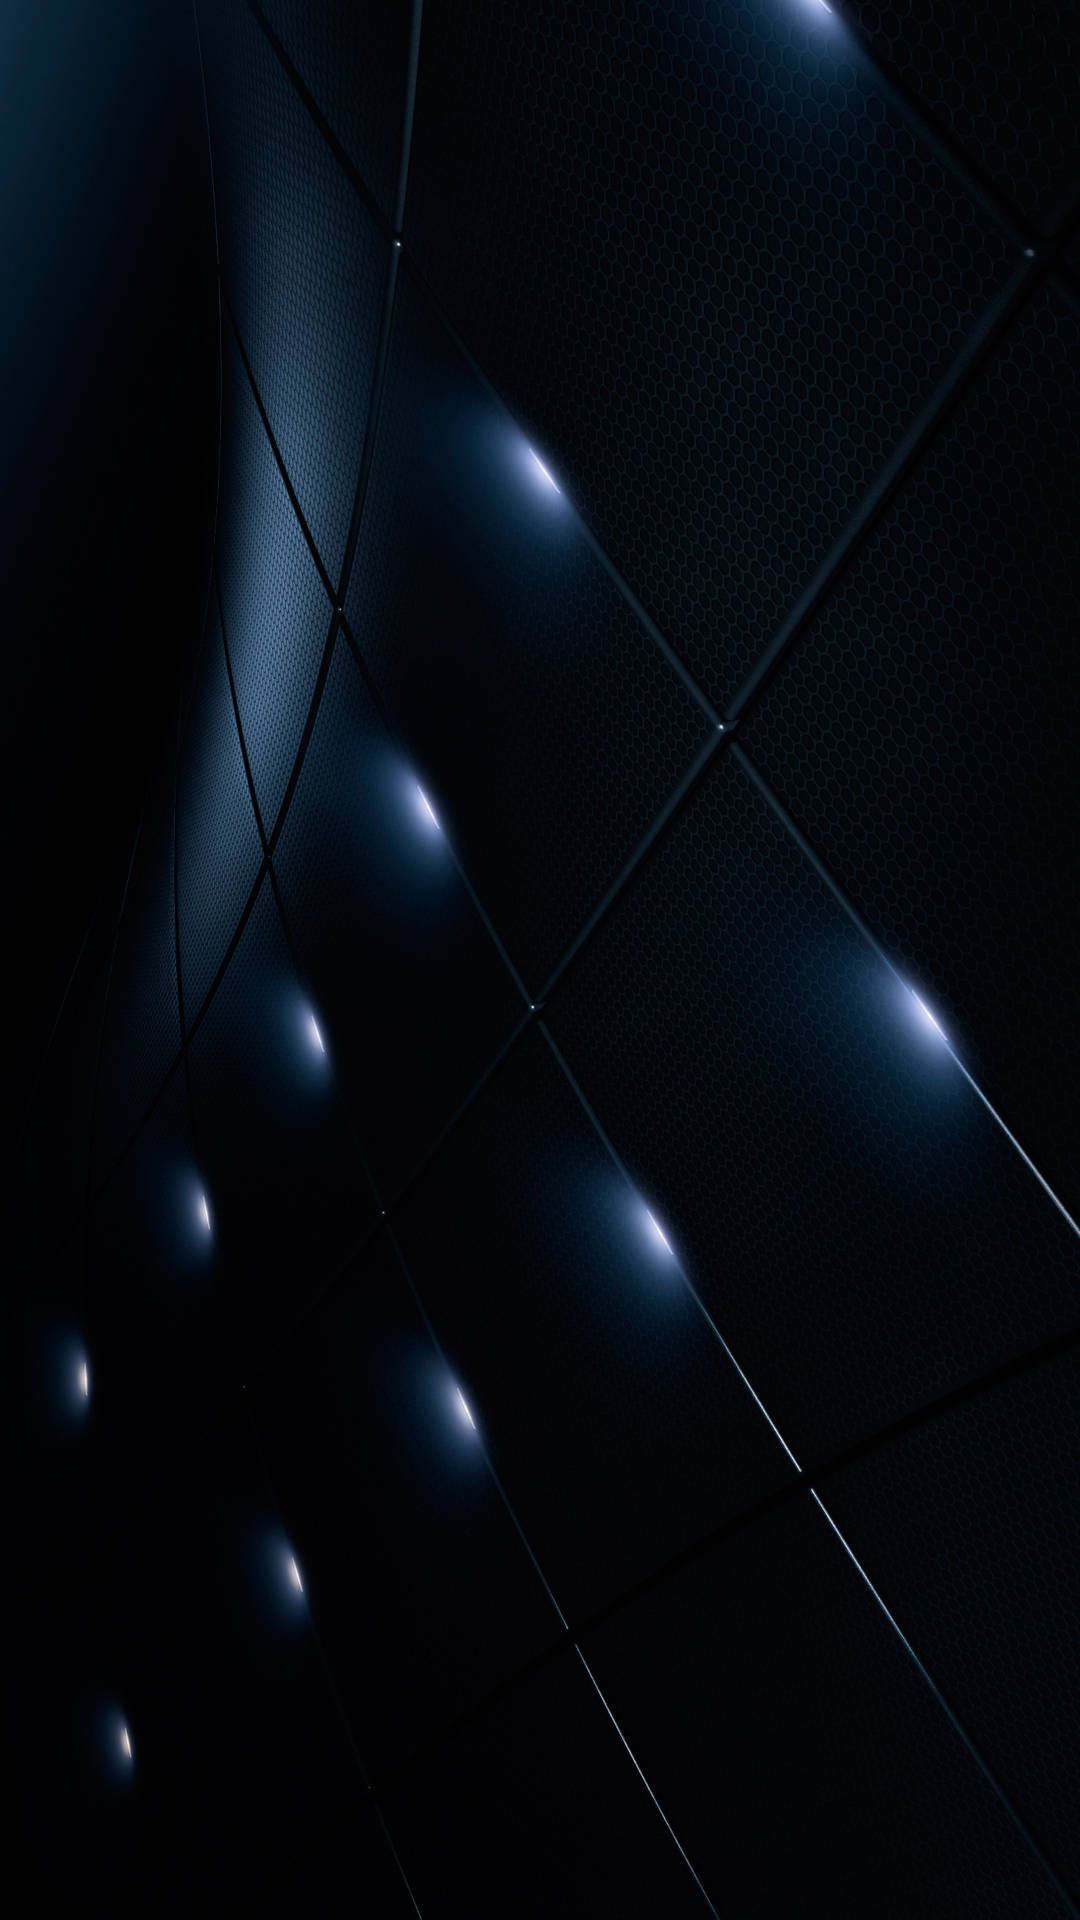 Wallpapers For Mobile Vertical Dark